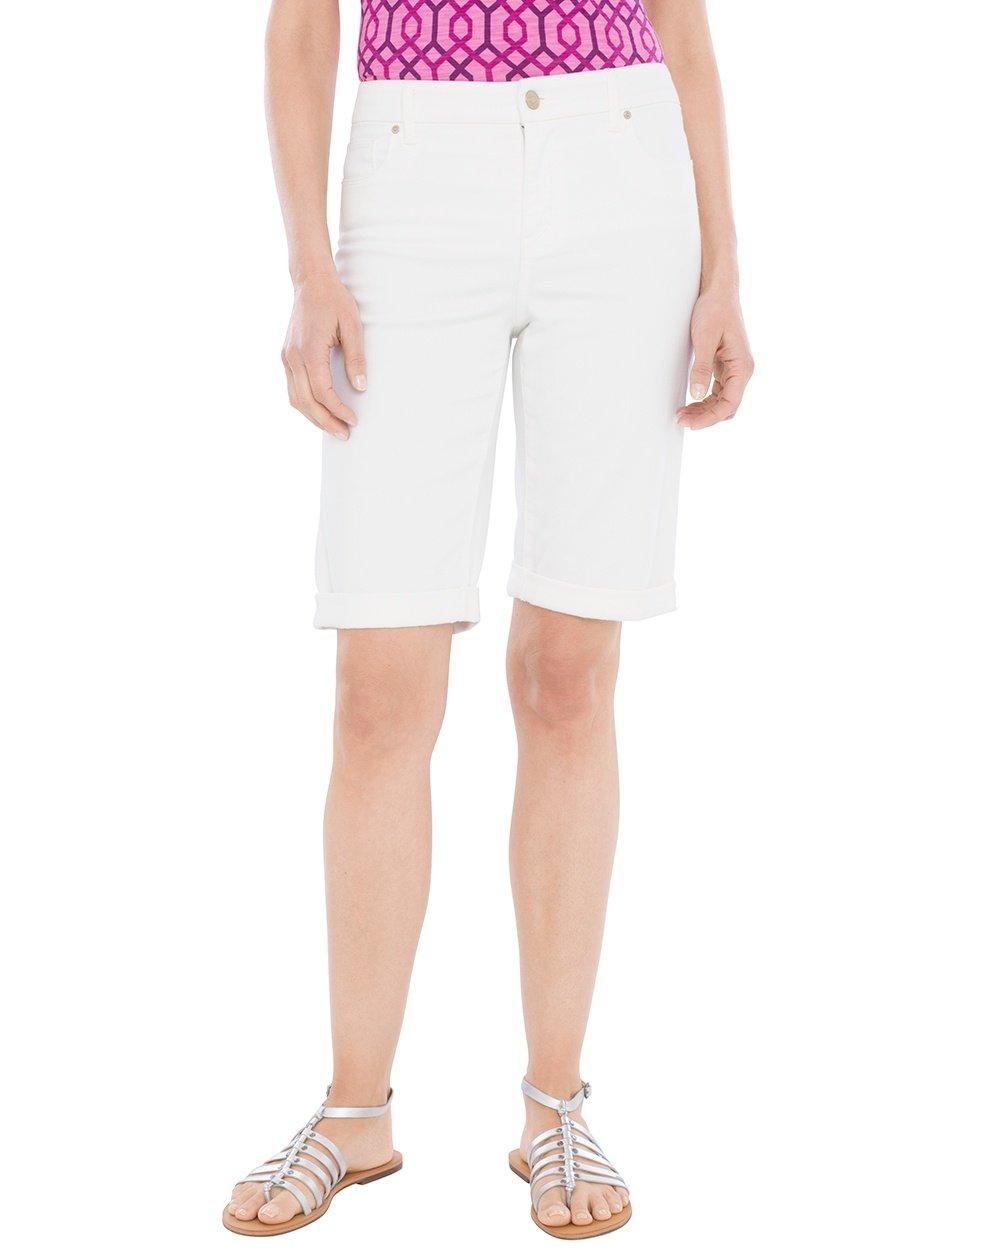 Chico's Women's So Slimming Girlfriend Shorts- 12 Inch Inseam Size 10 M (1.5) White